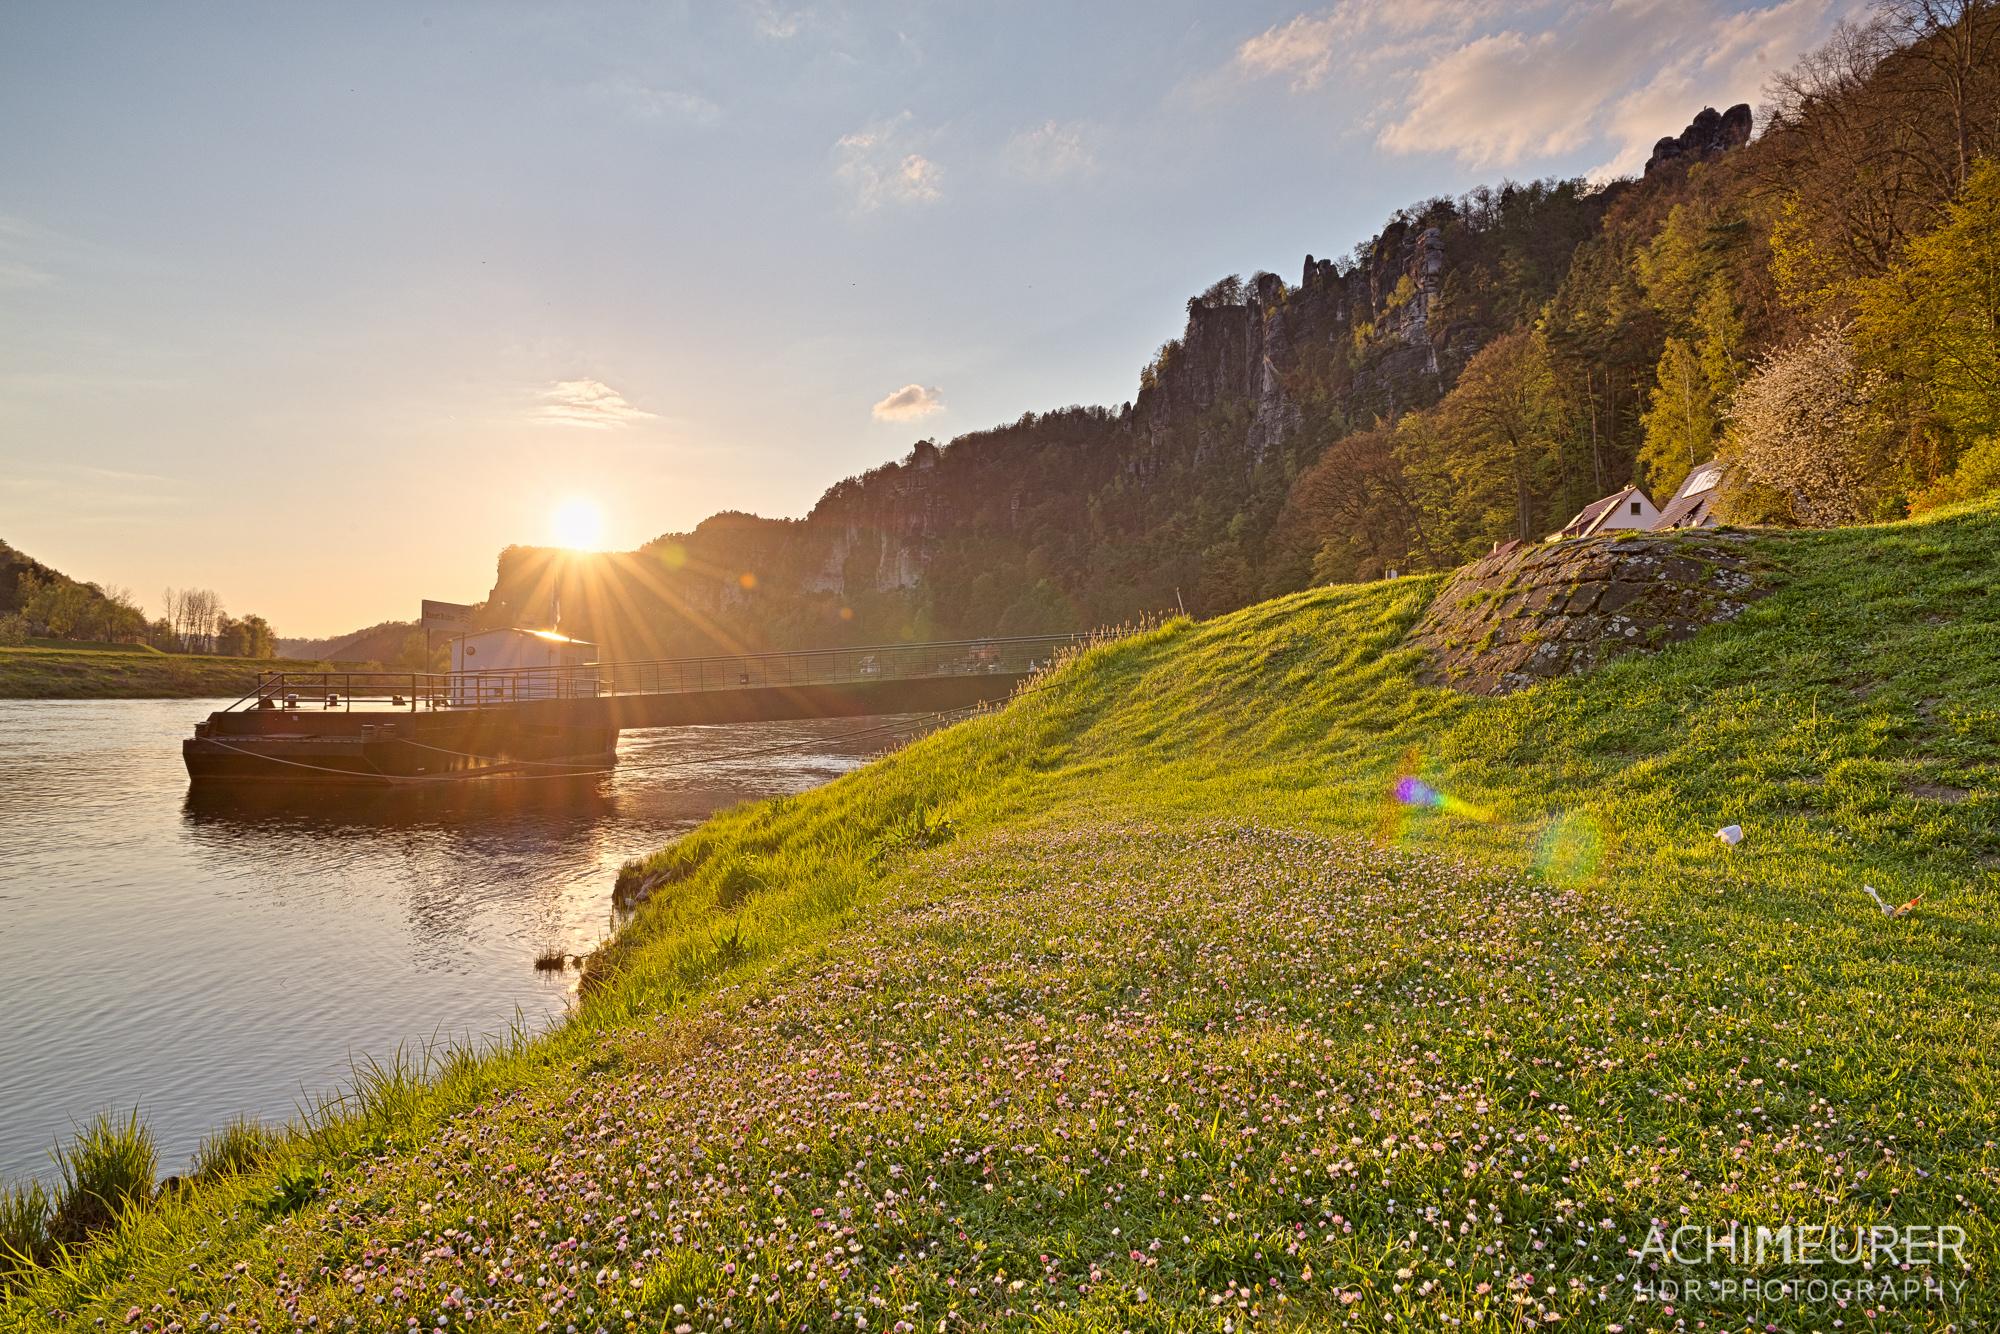 Rathen-Saechsische-Schweiz-Landschaft-Sonnenuntergang_8200_199_198_197_196_195_194_HDR